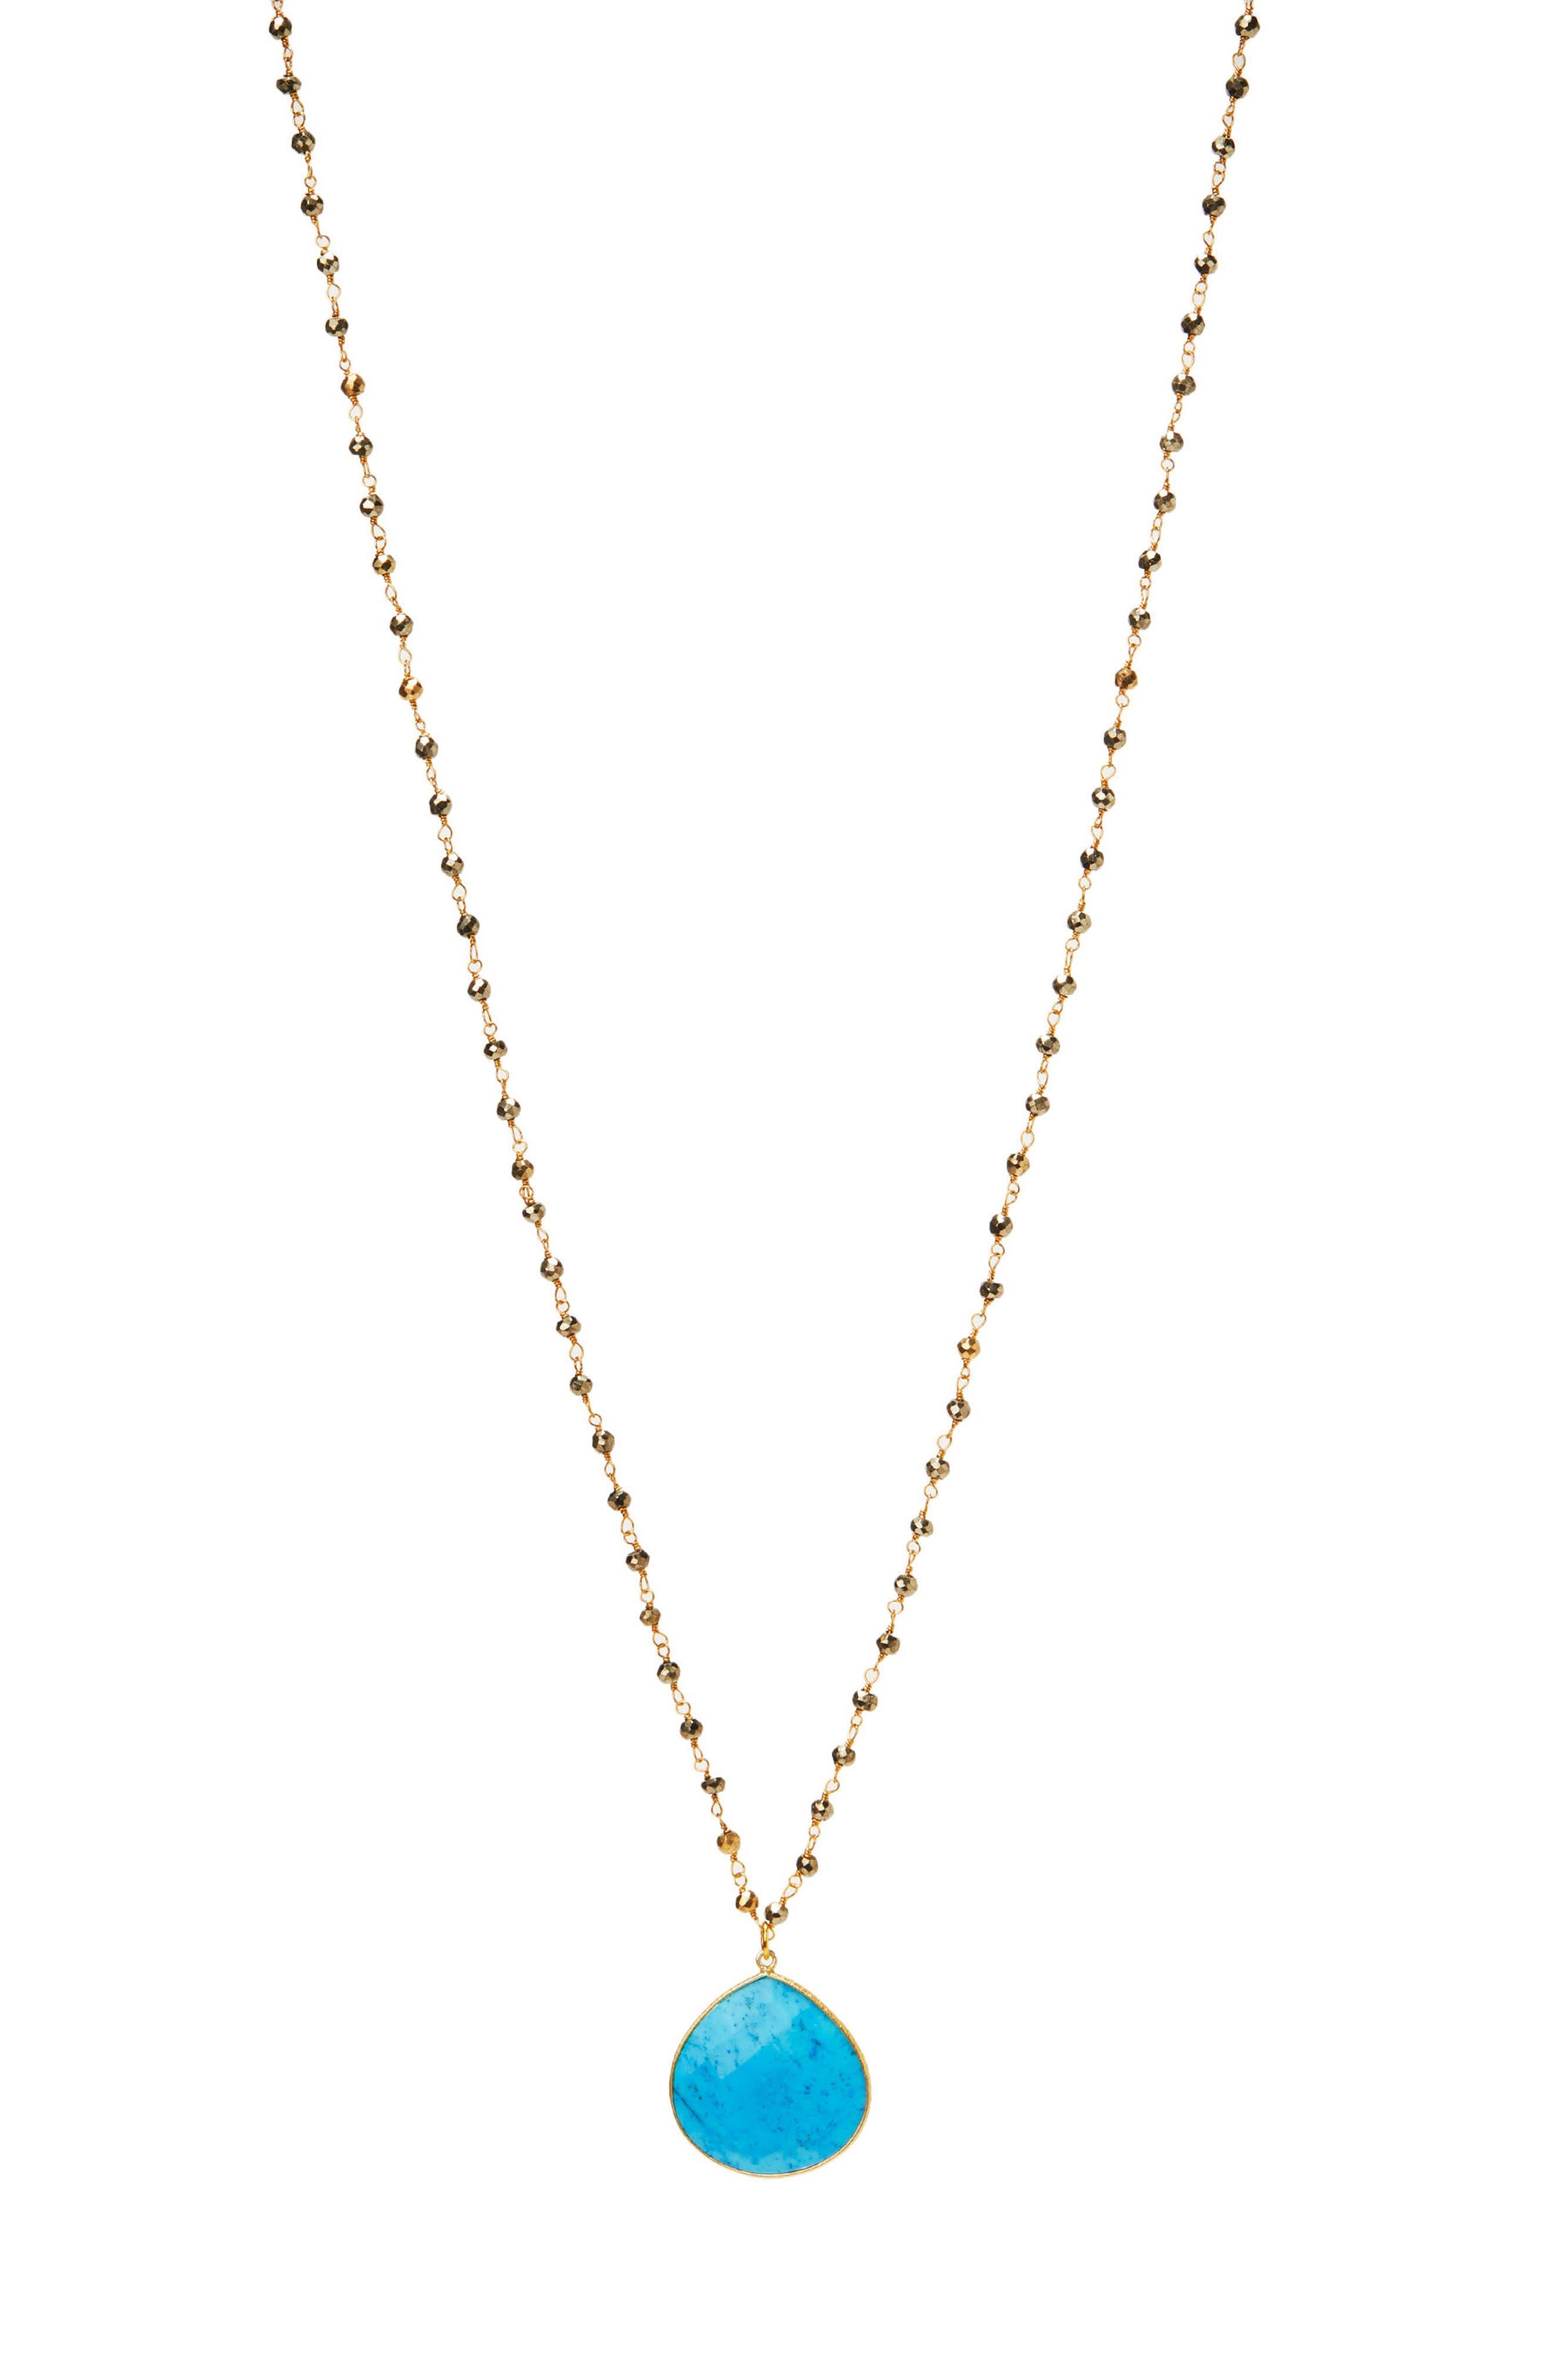 Main Image - Jemma Sands Monterey Semiprecious Stone Pendant Necklace